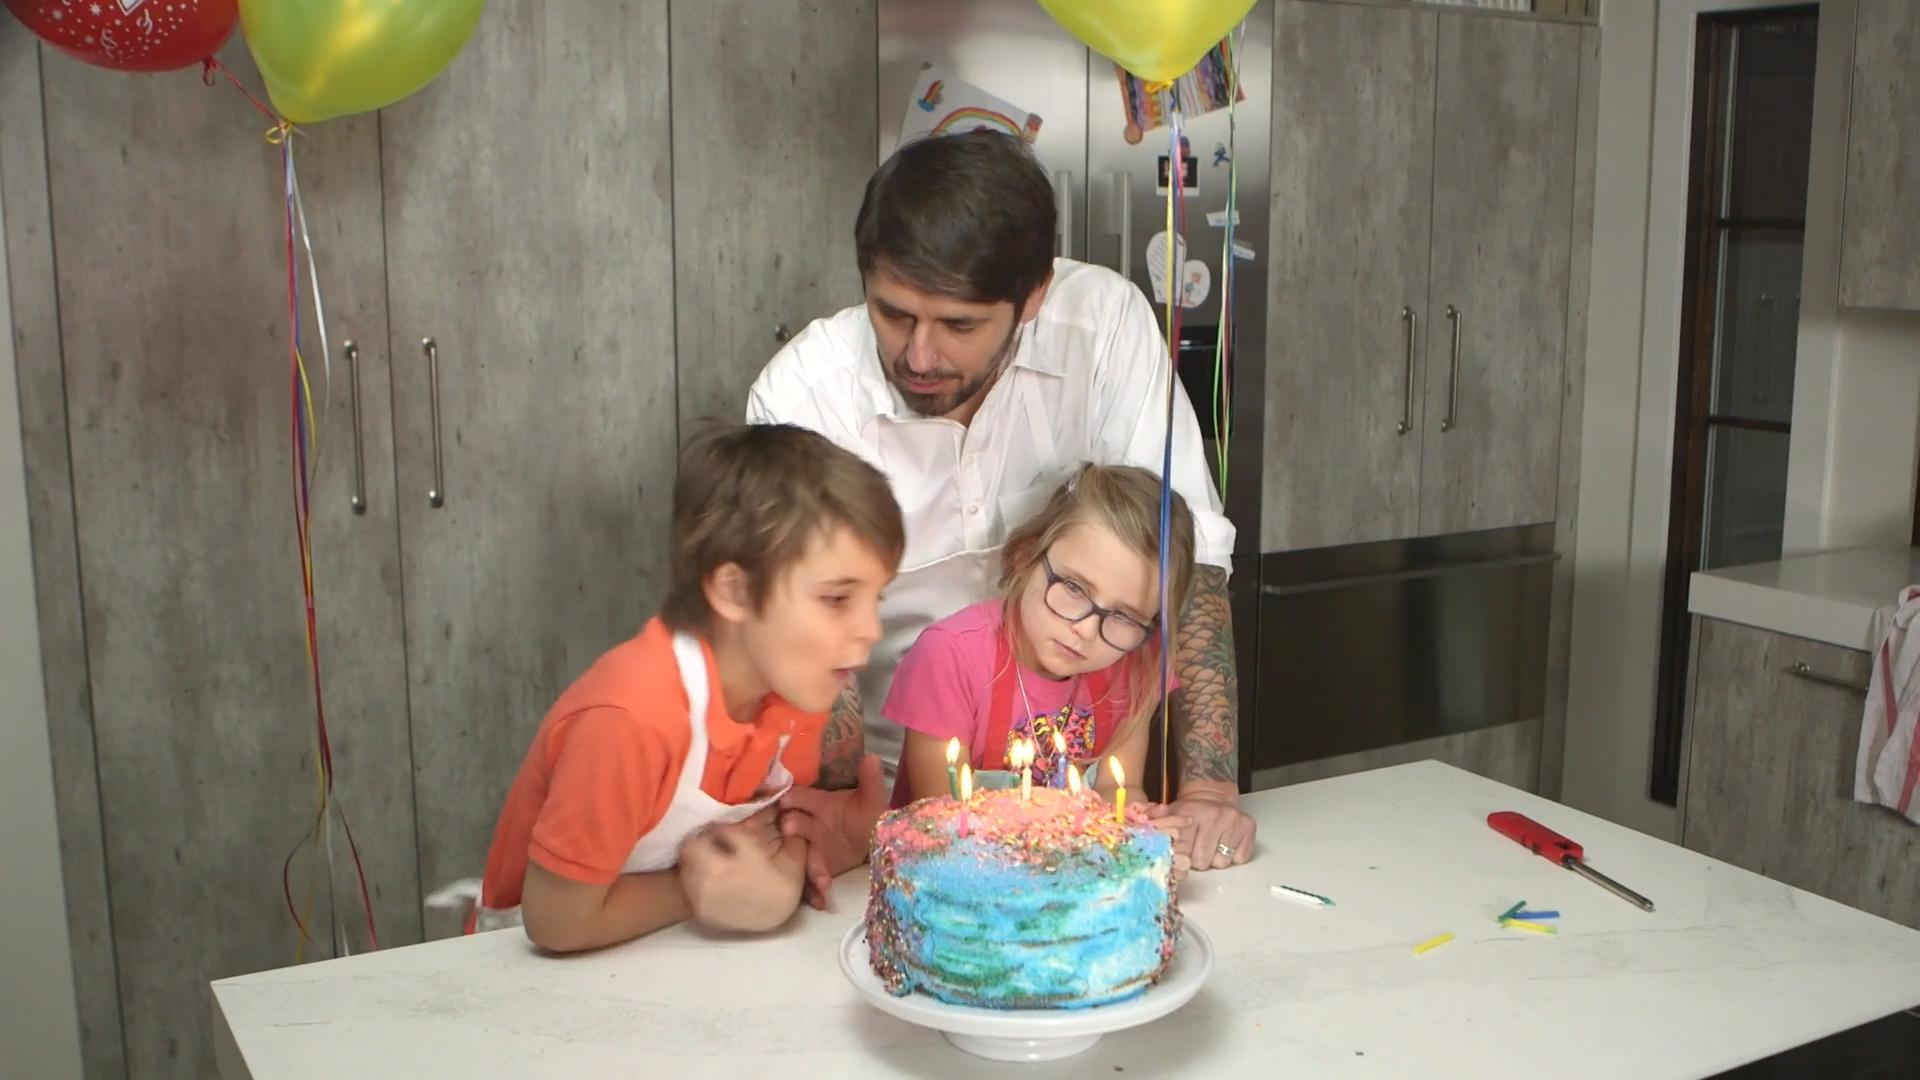 How to Make a Kid-Friendly Birthday Cake